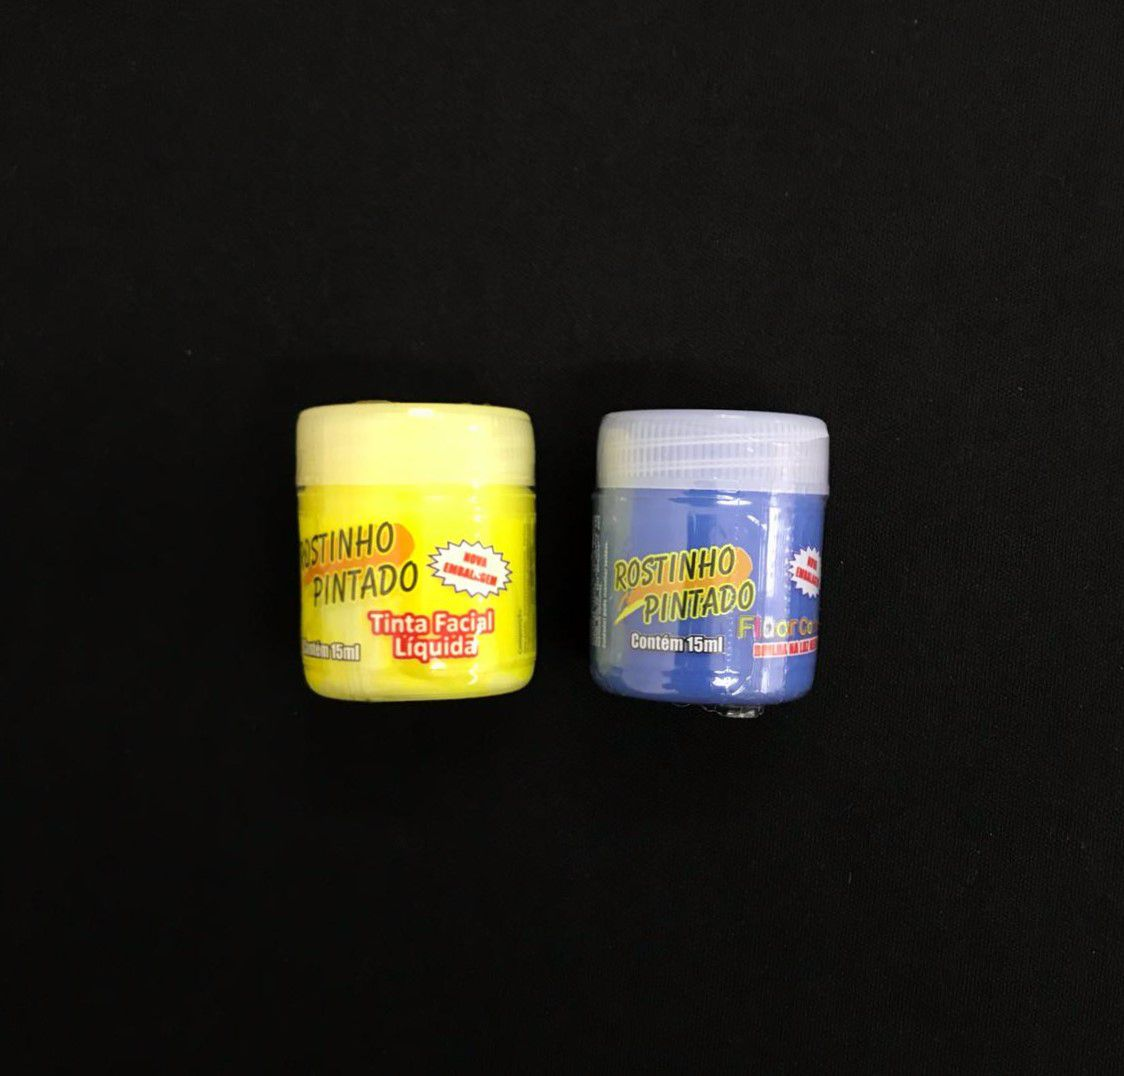 Tinta Líquida Flúor (neon) 15ml Rostinho Pintado